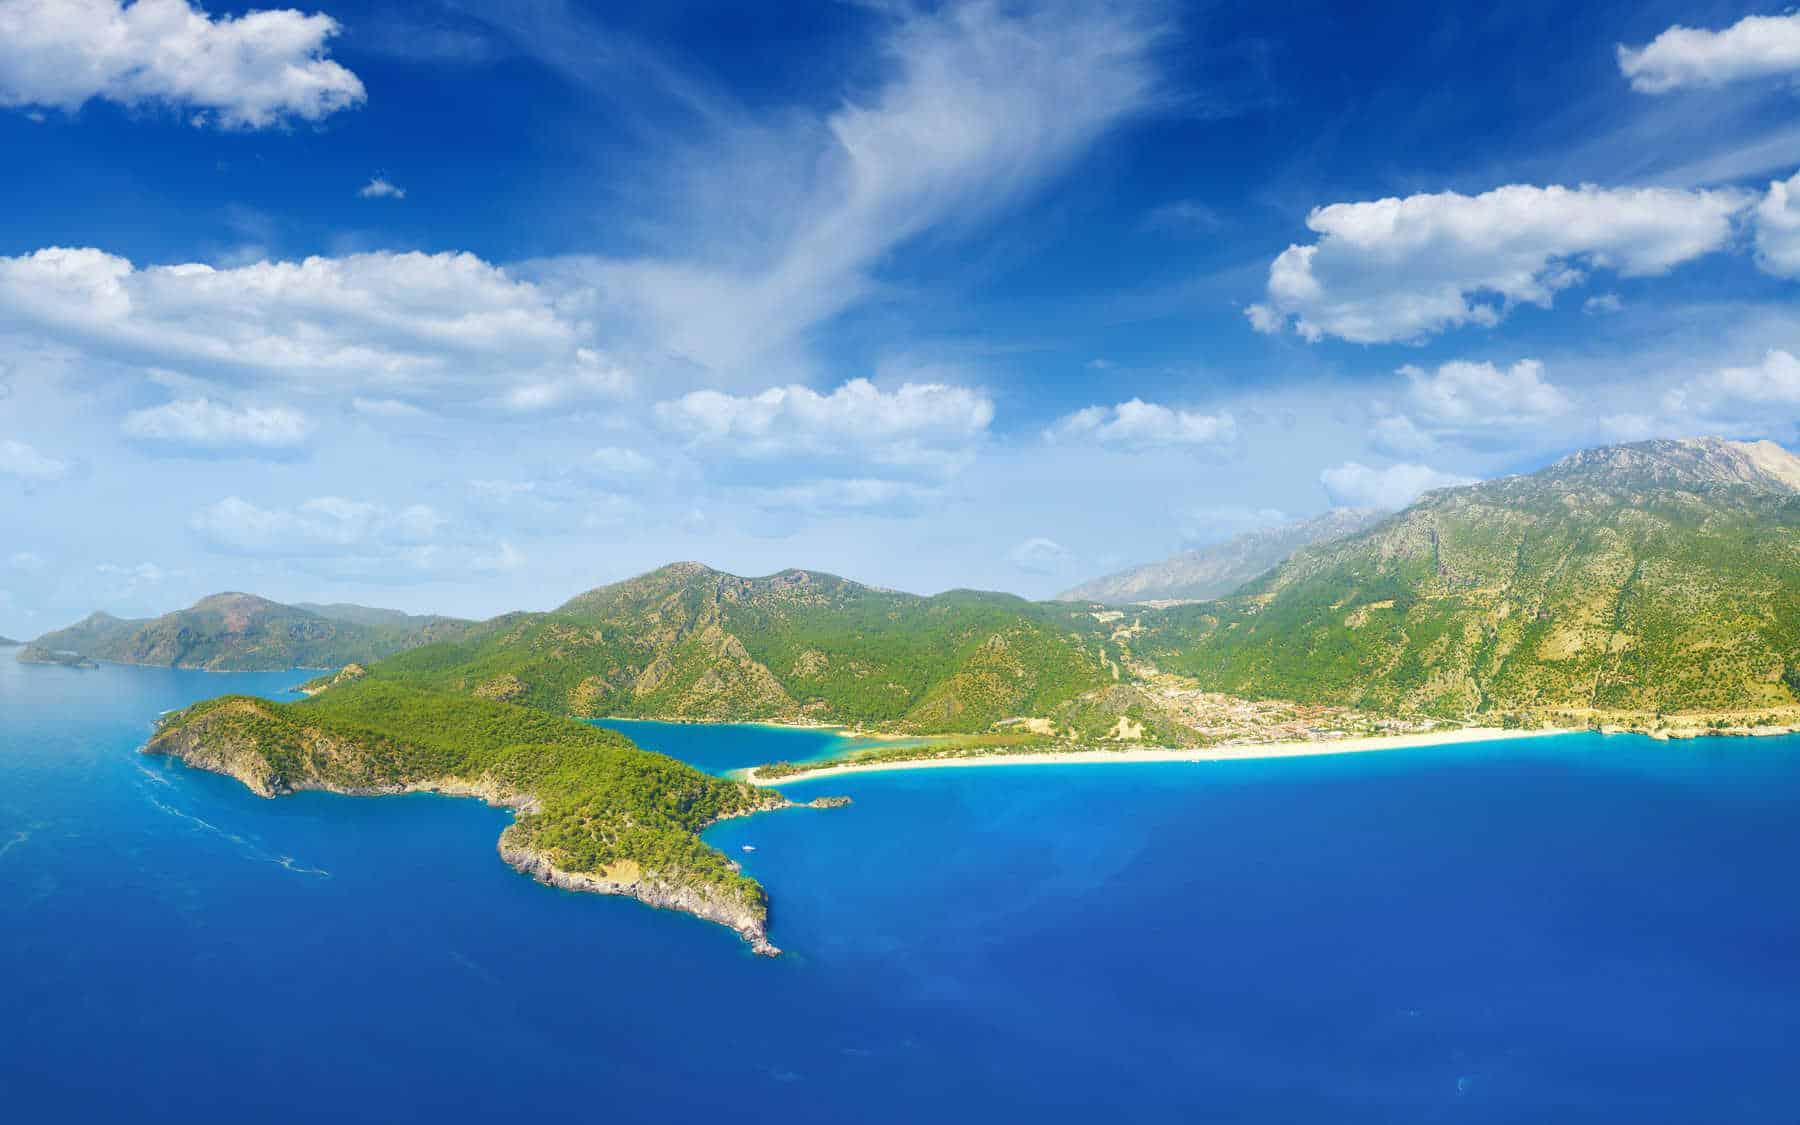 Aerial view of beautiful blue lagoon and coastline in Oludeniz, Fethiye district, Turquoise Coast of southwestern Turkey